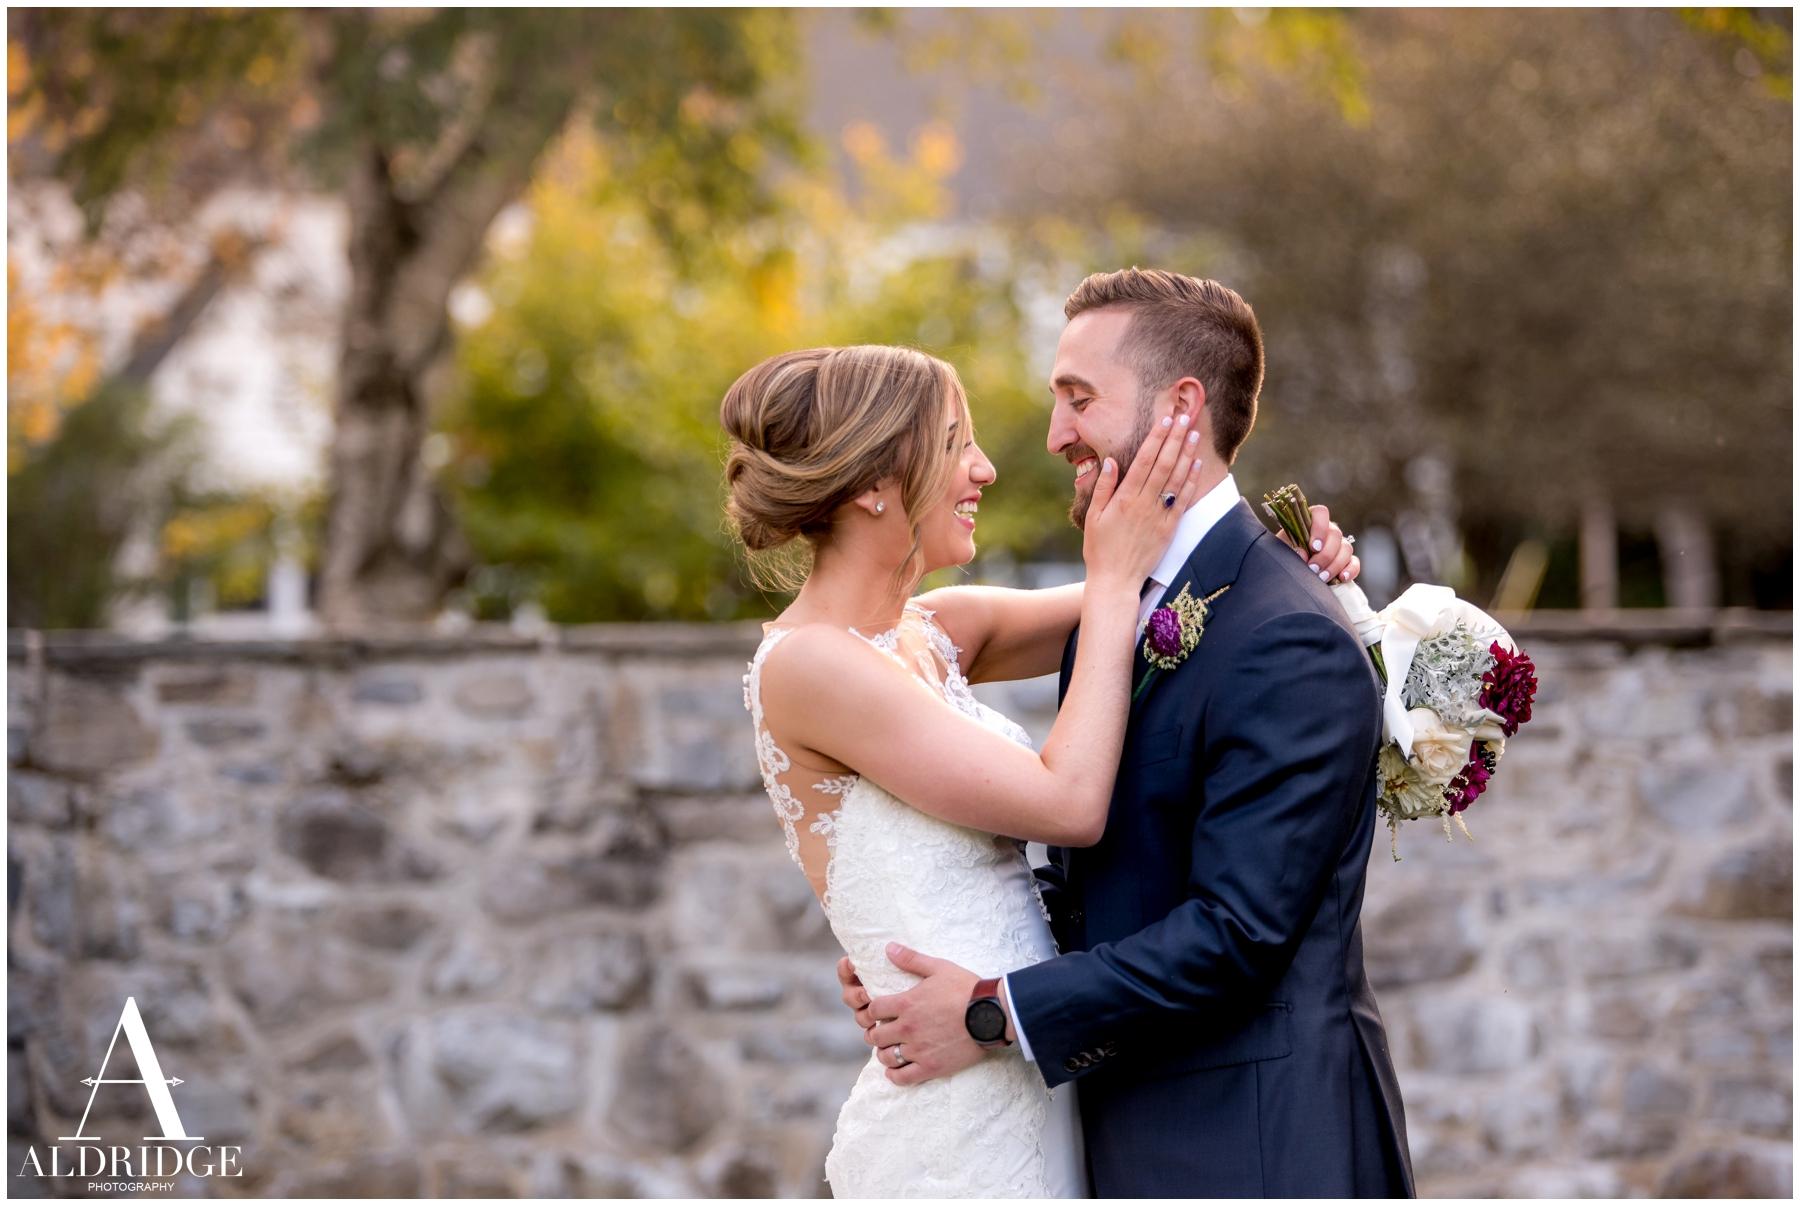 Wedding photographer Saratoga Springs New York